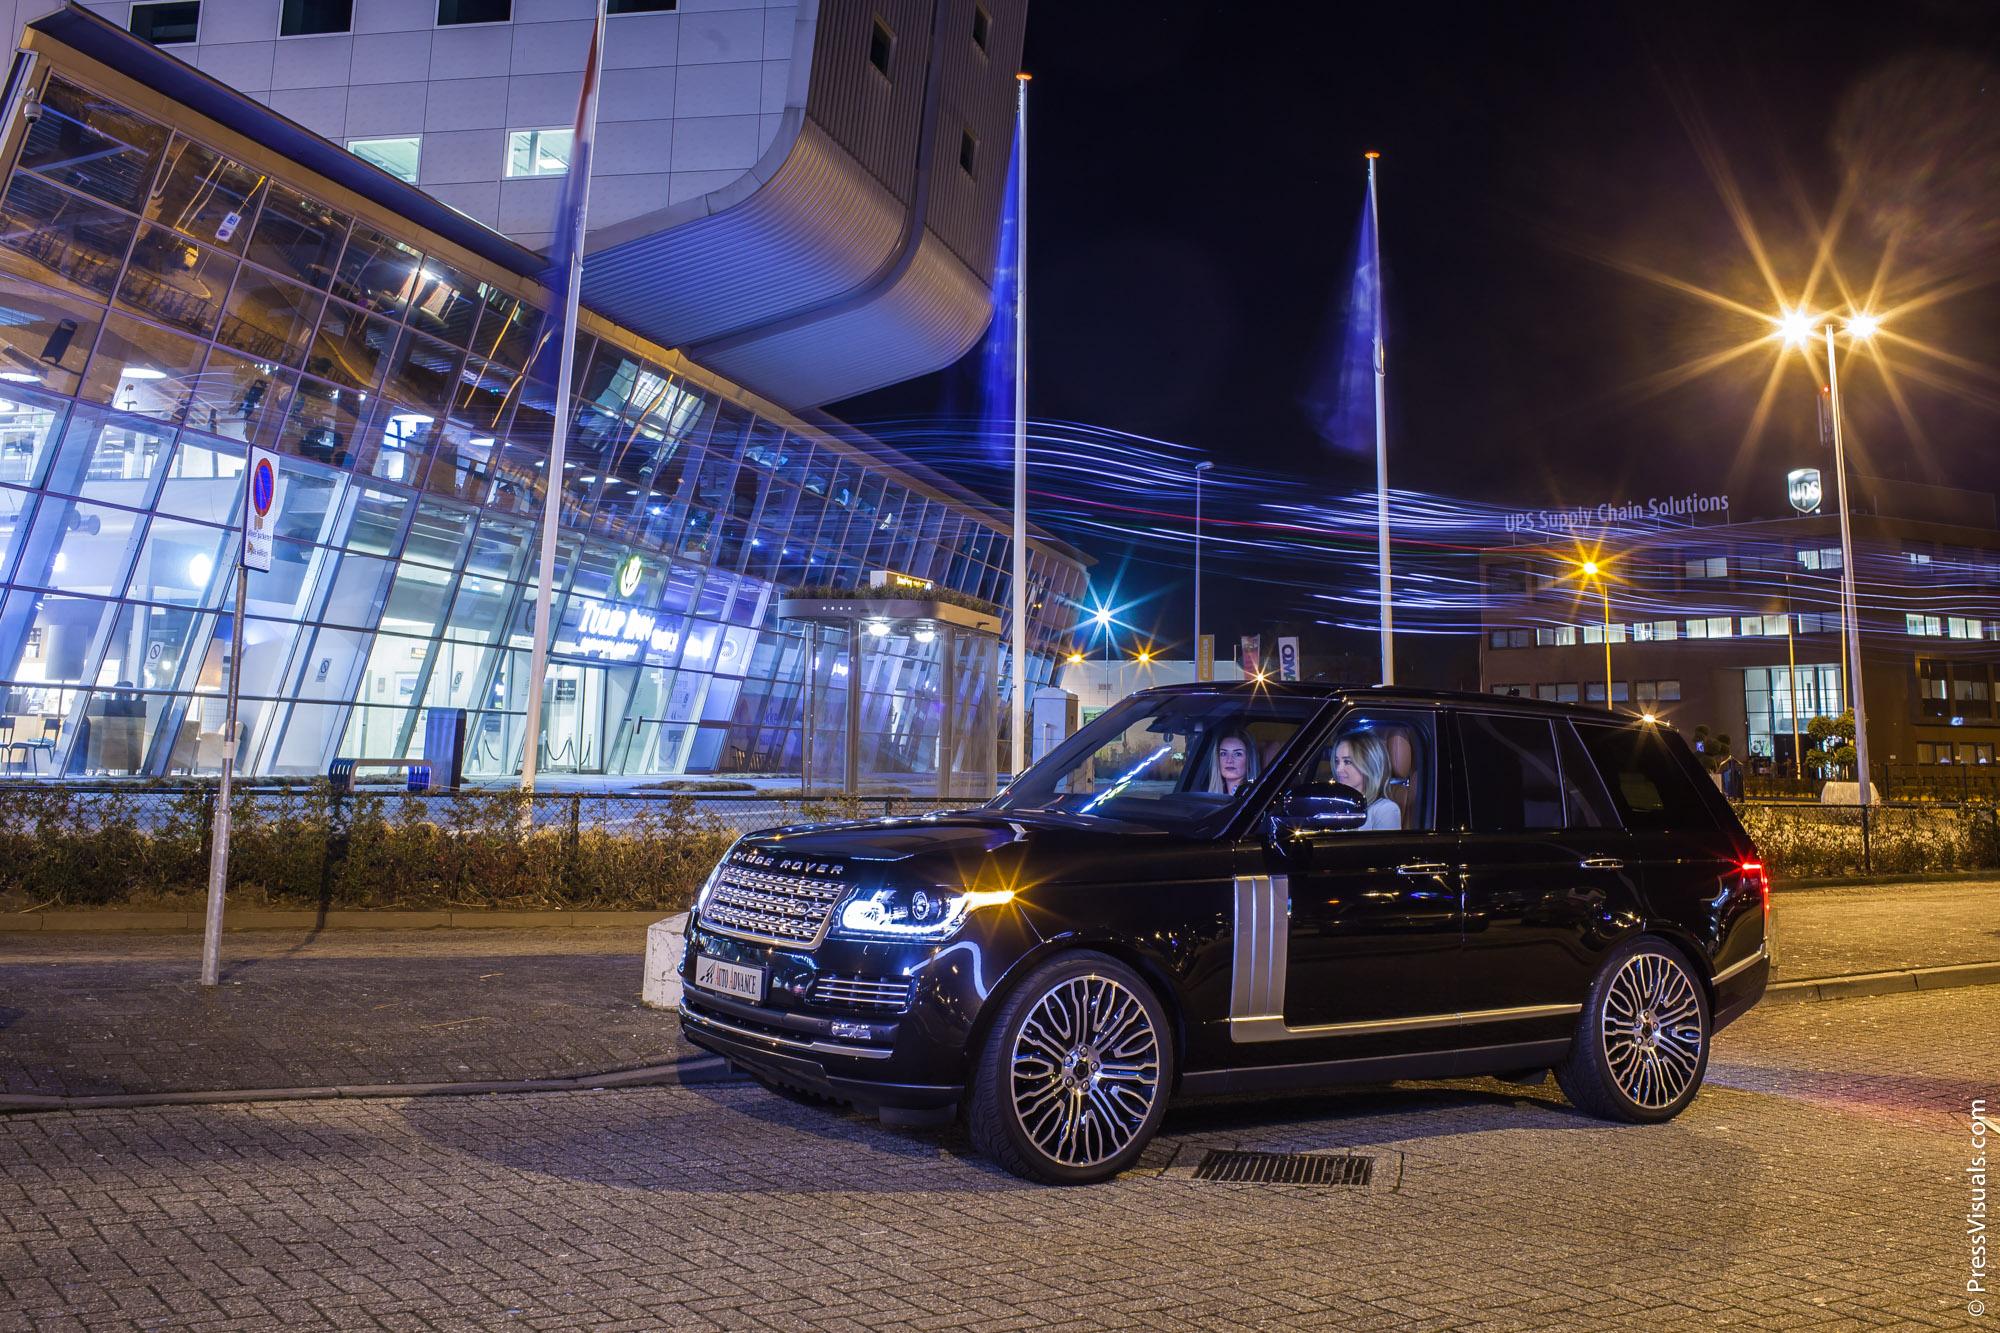 Range Rover | Auto Advance | Eindhoven Airport